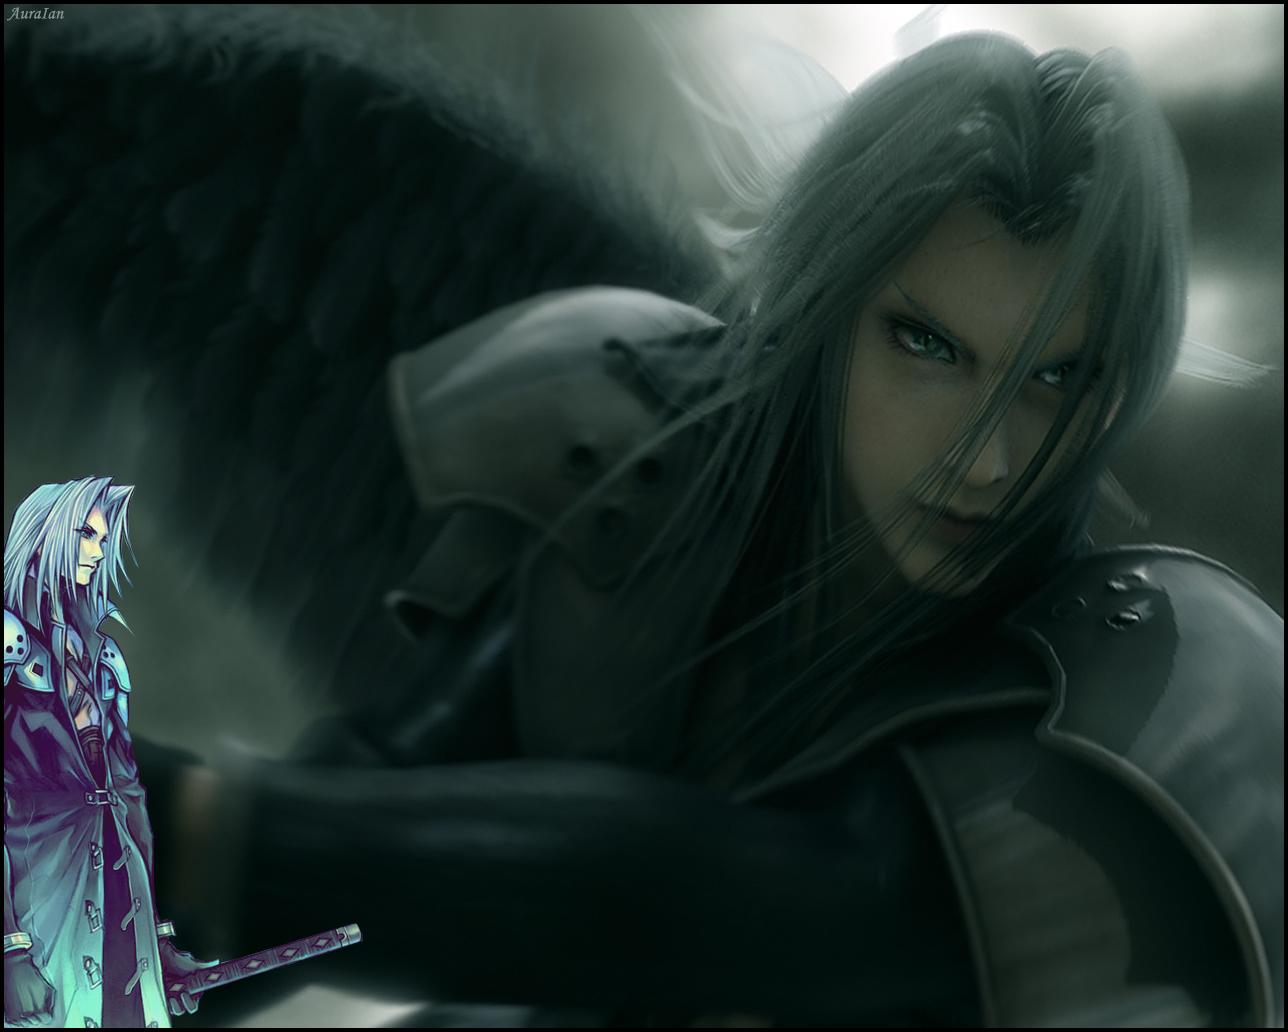 Sephiroth by AuraIan